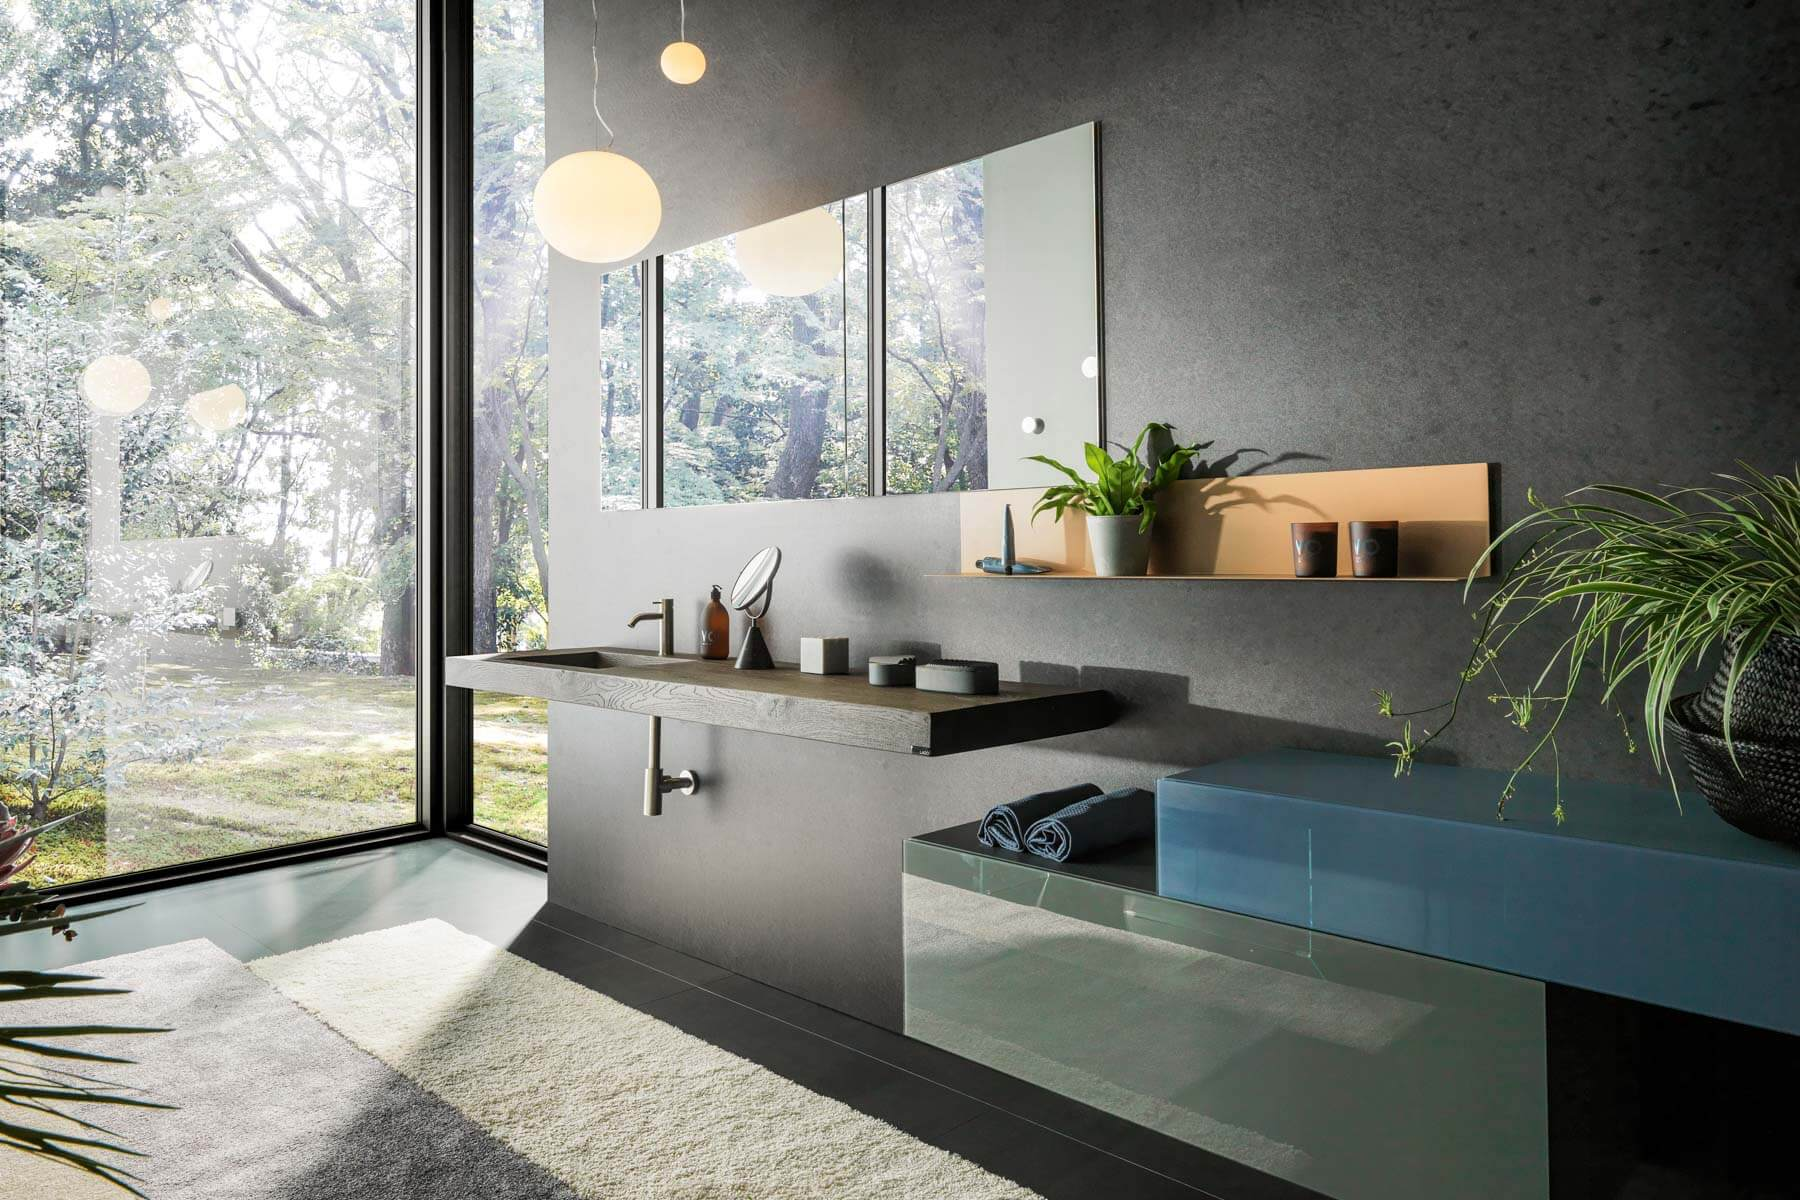 mobili per bagno linee moderne